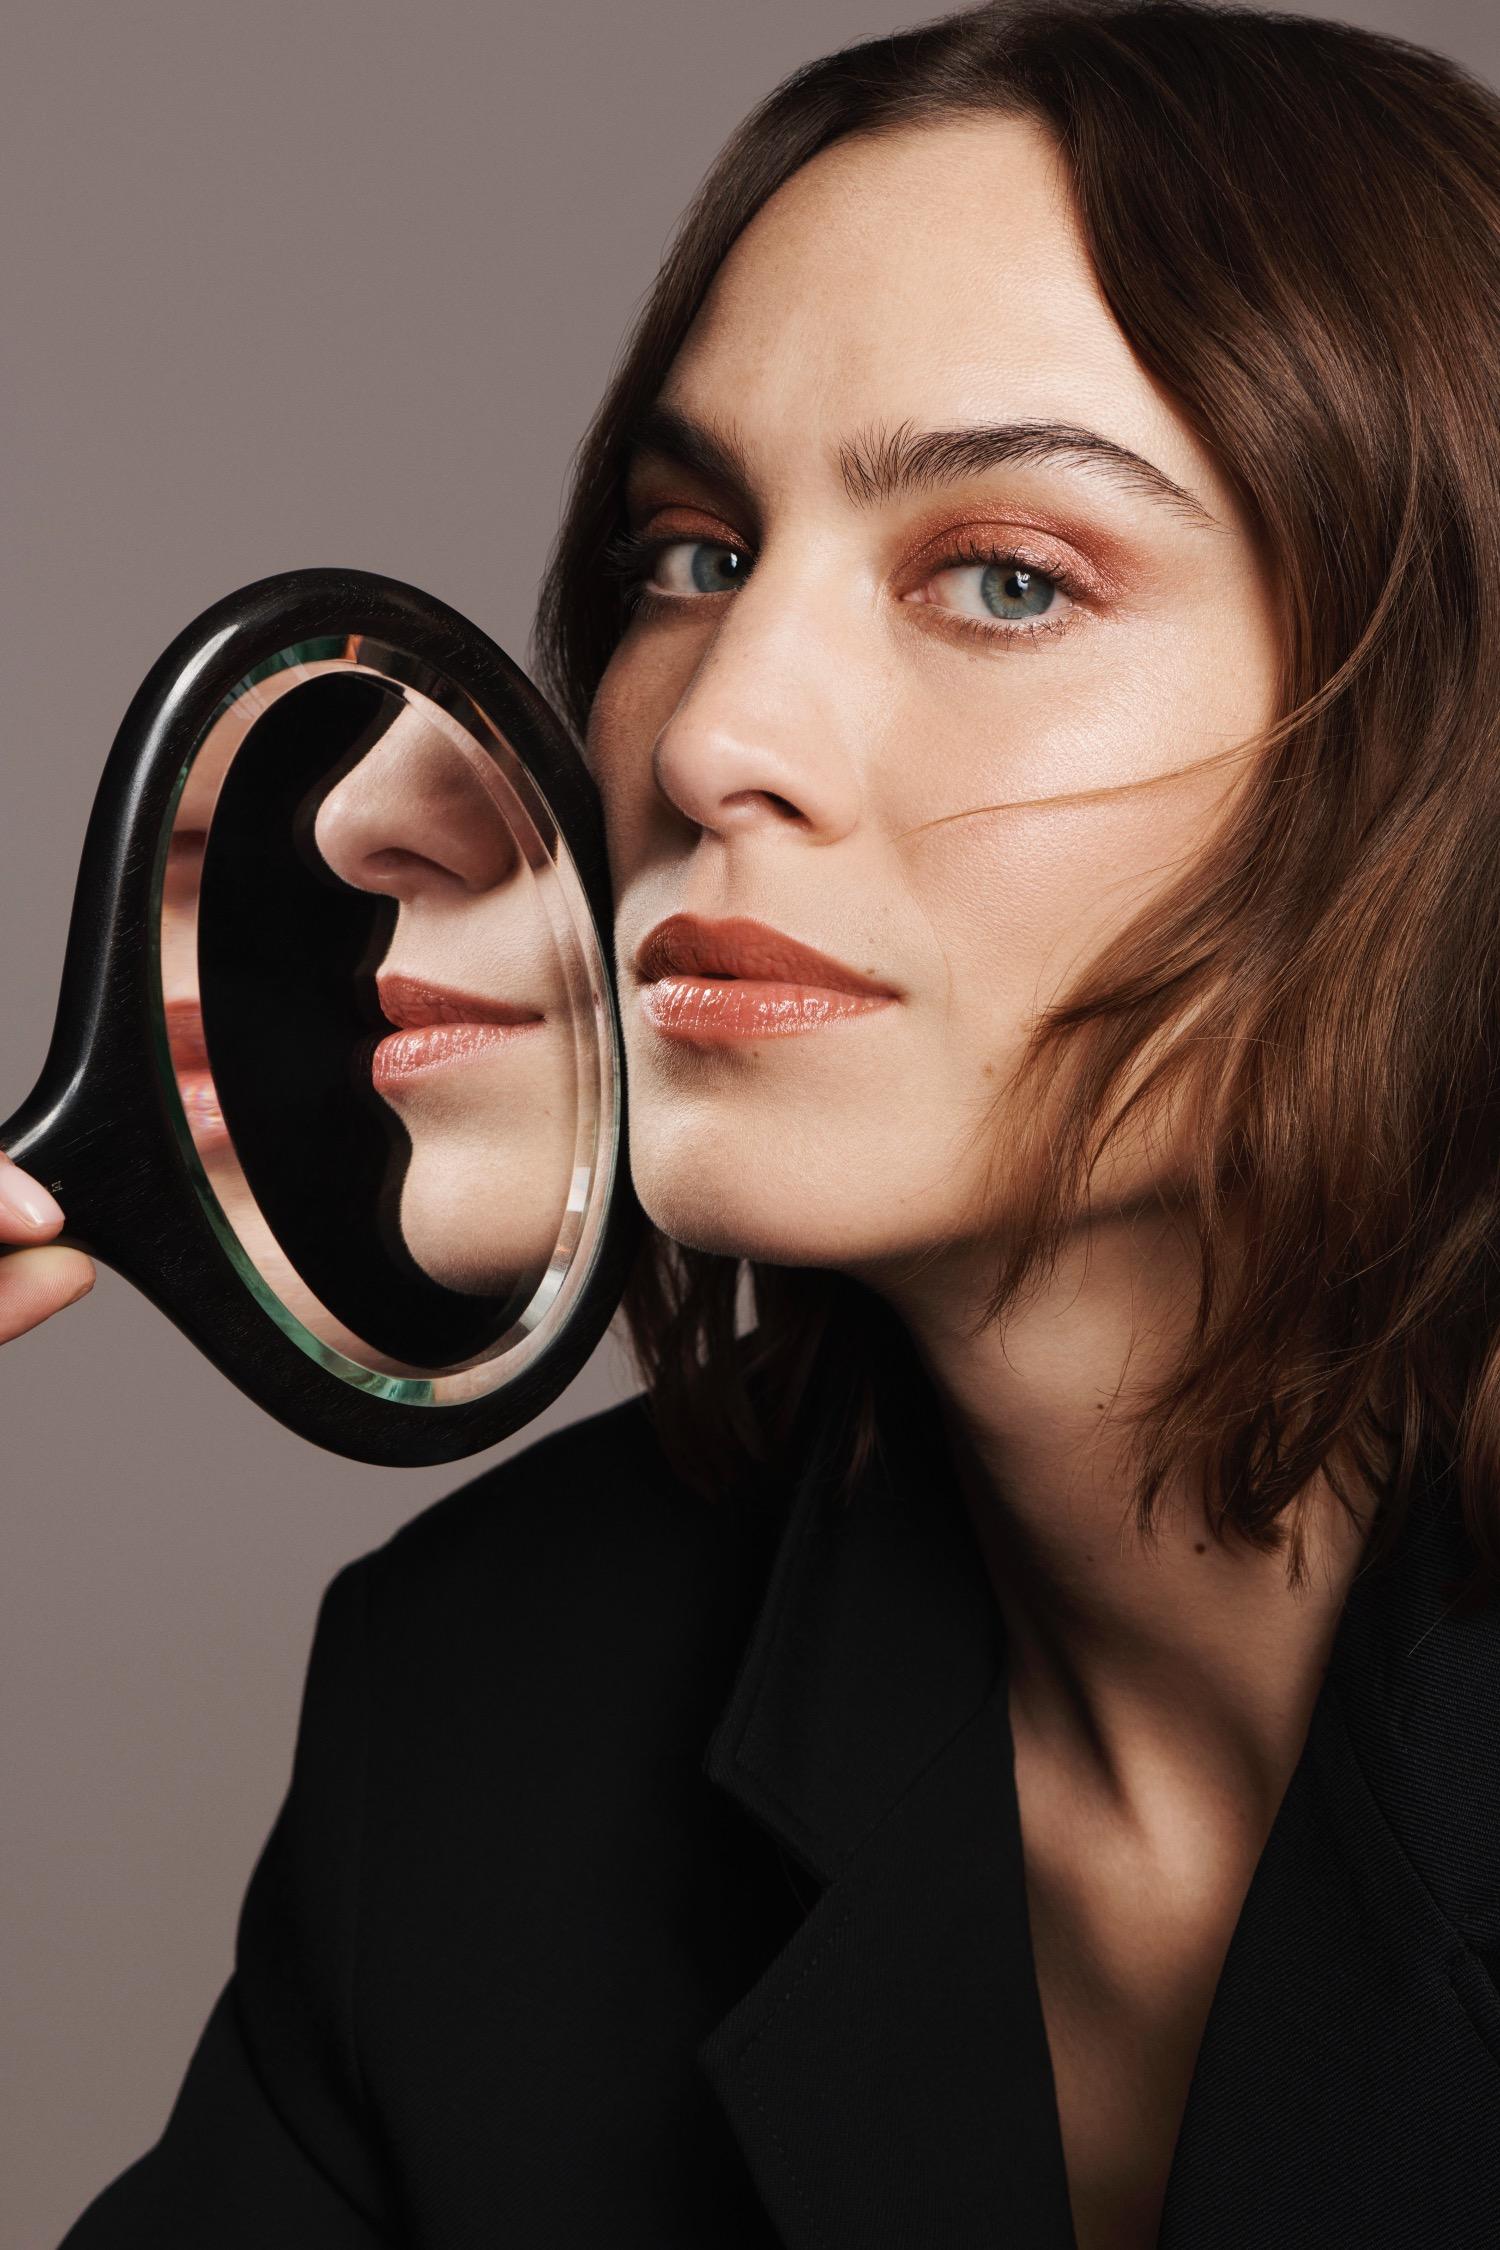 Alexa Chung Wears Code 8 Makeup